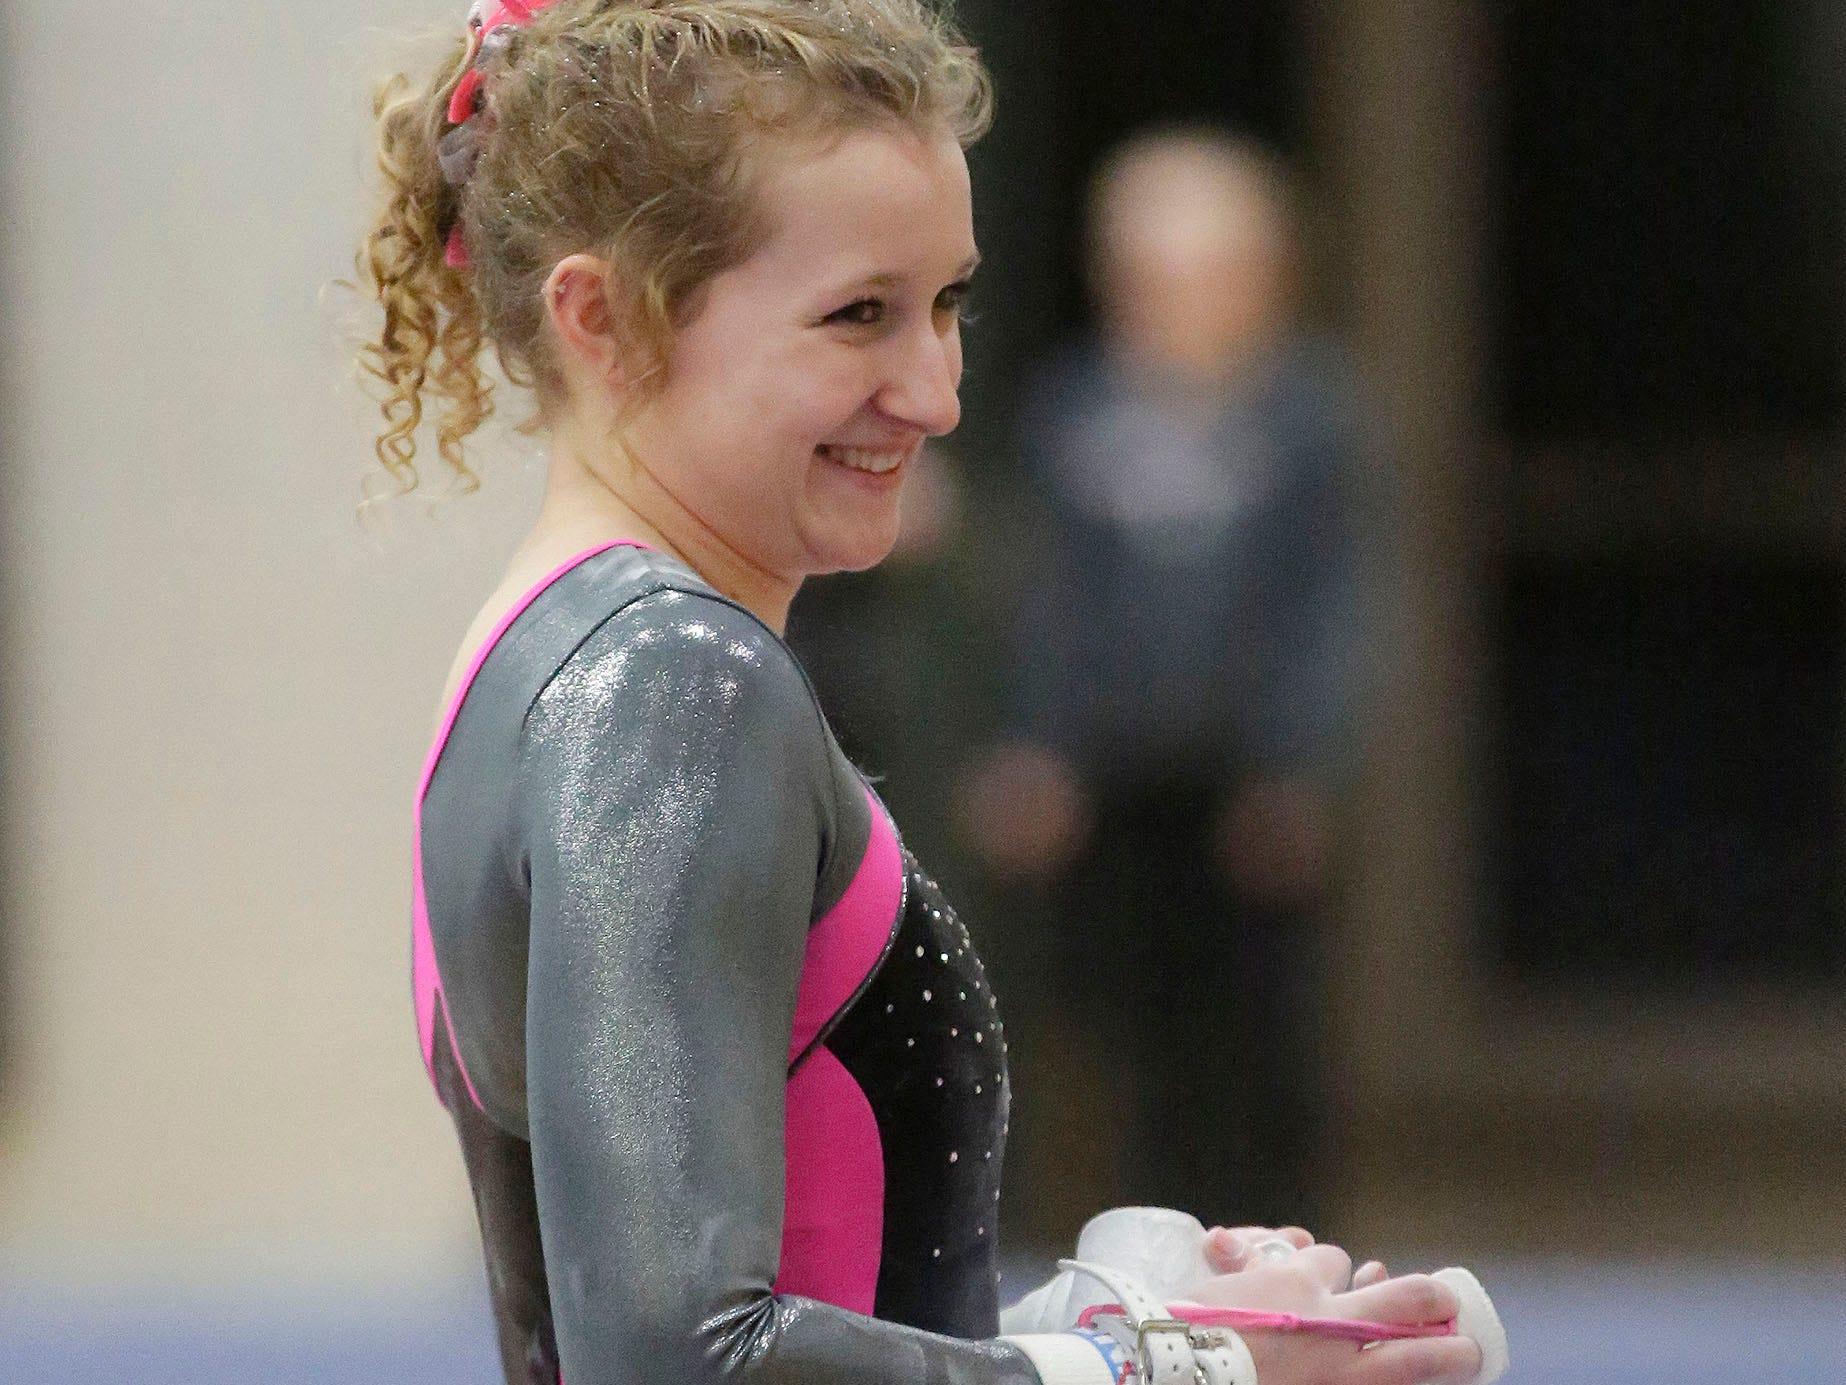 Sheboygan North/South's Annika Glaven smiles during the WIAA Eastern Valley Conference Gymnastics Meet at Sheboygan South, Friday, February 15, 2019, in Sheboygan, Wis.